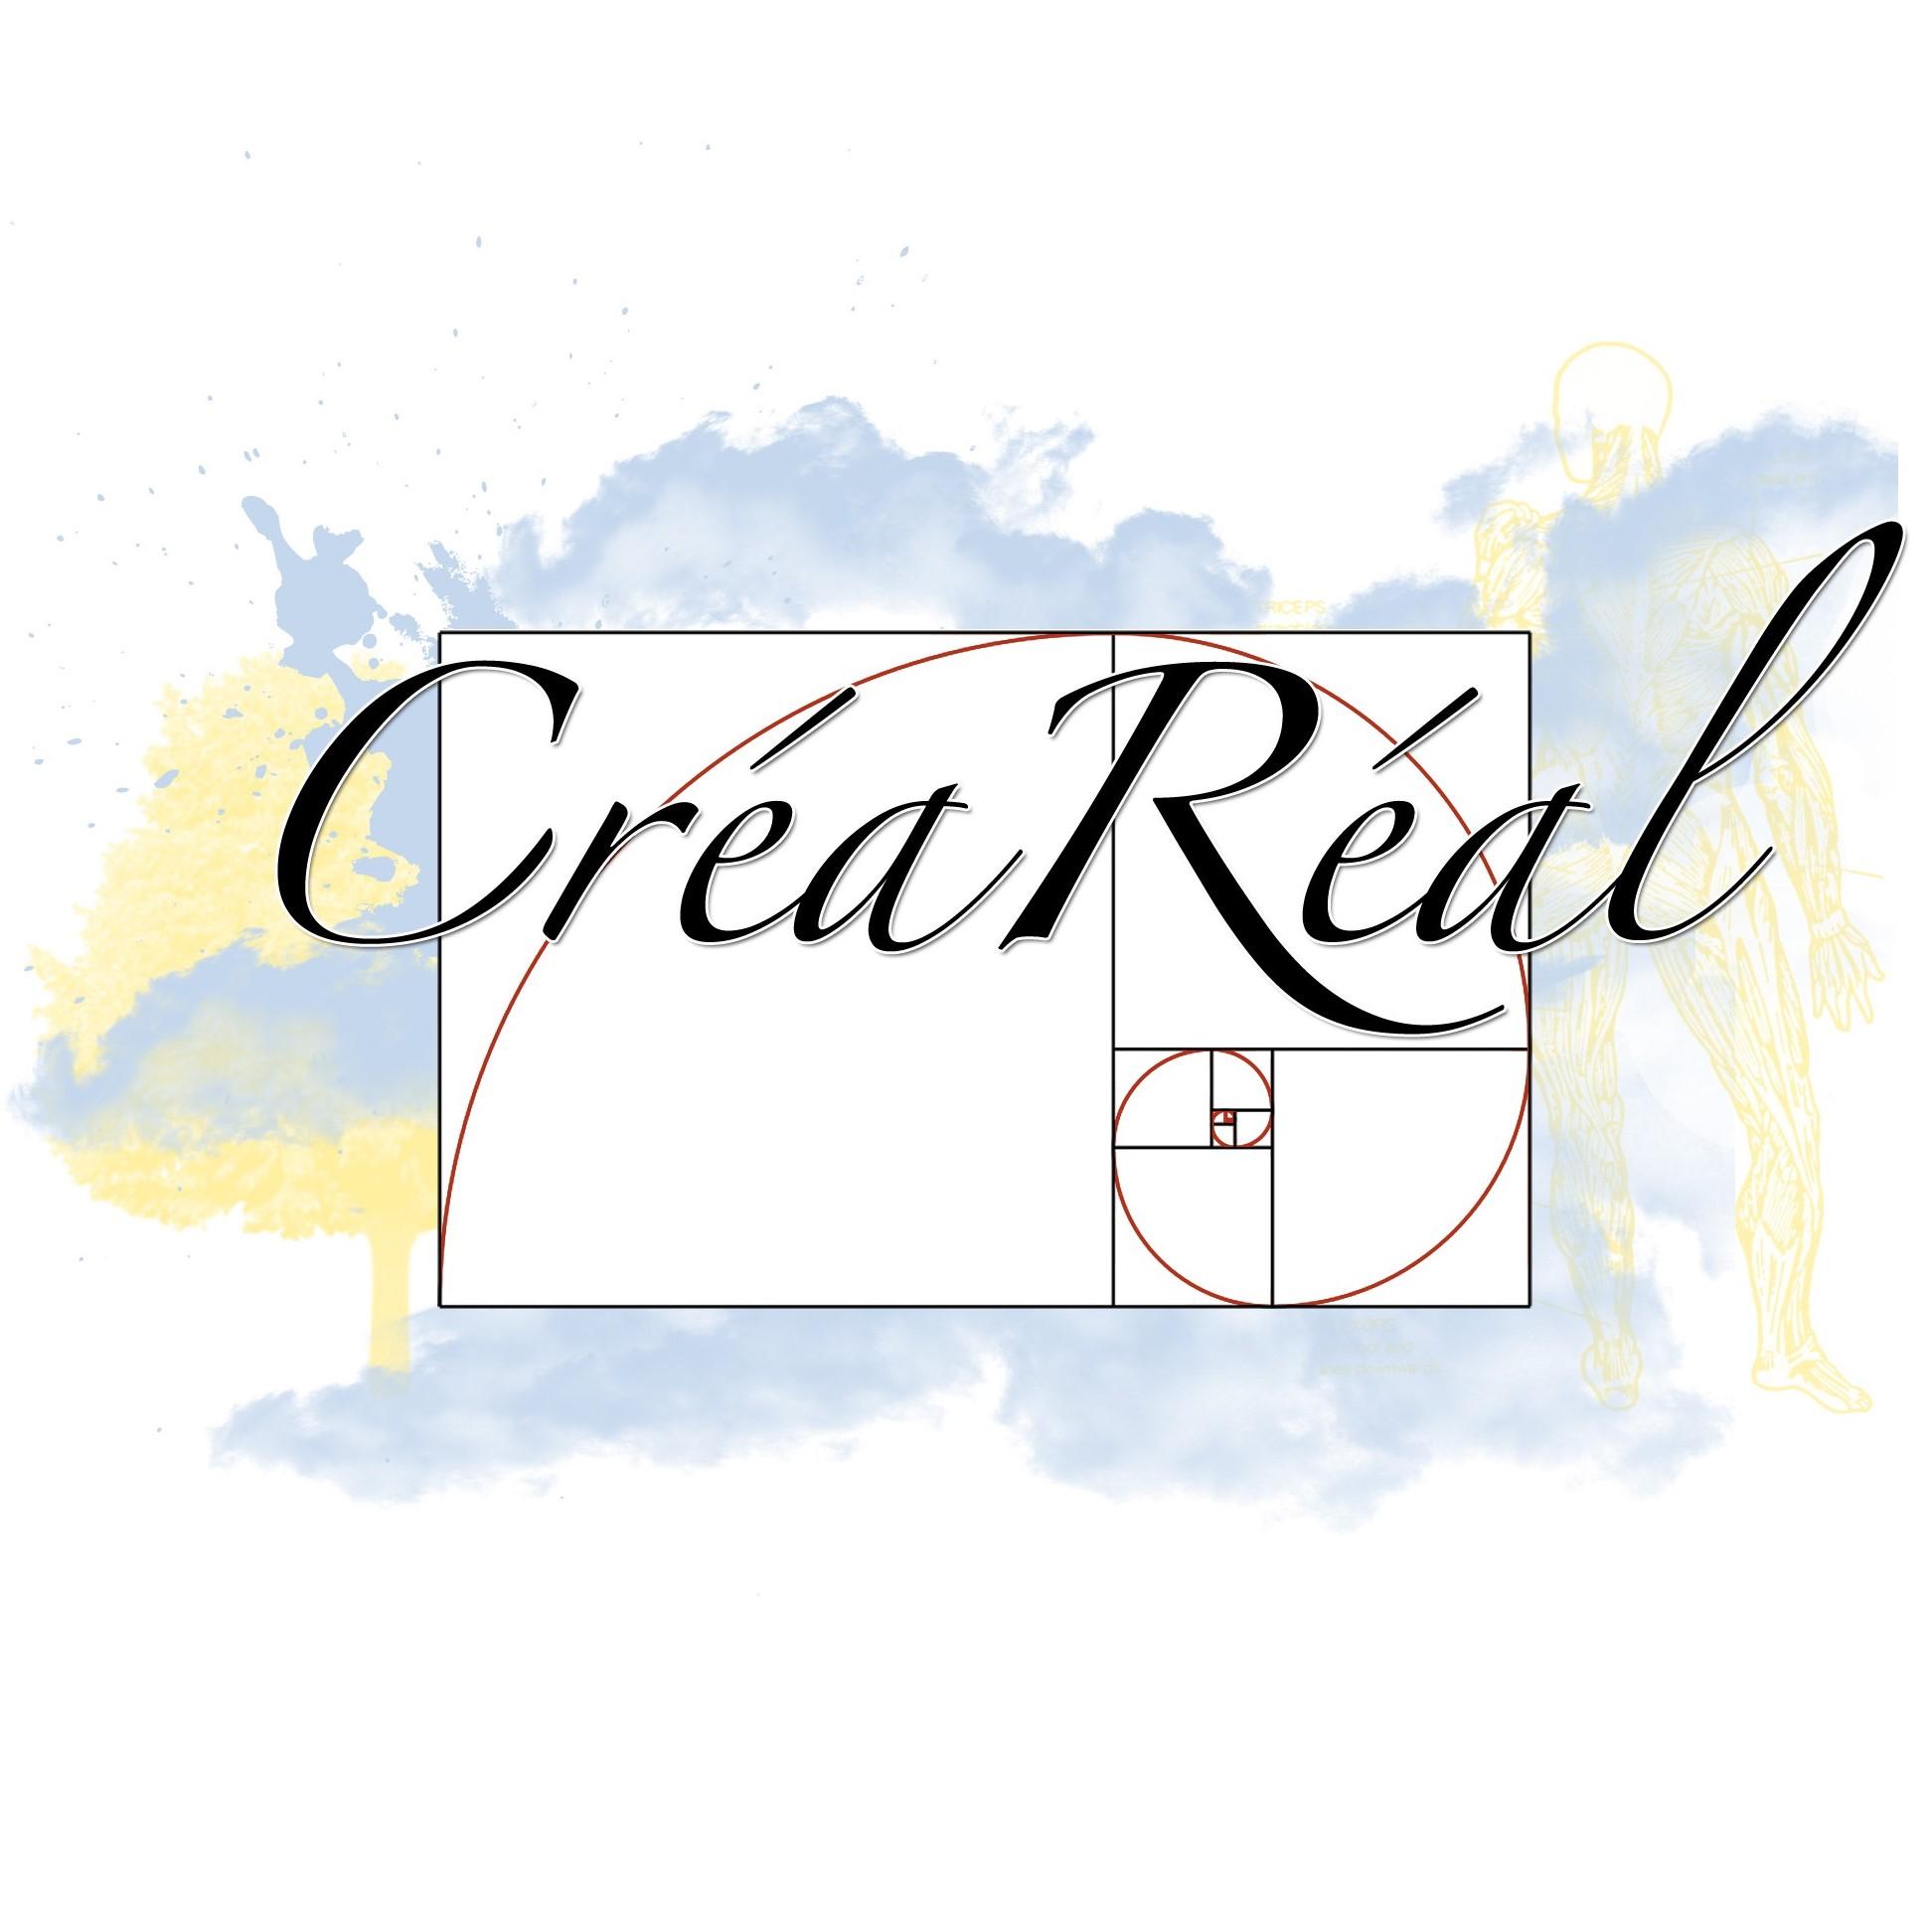 CreaReal